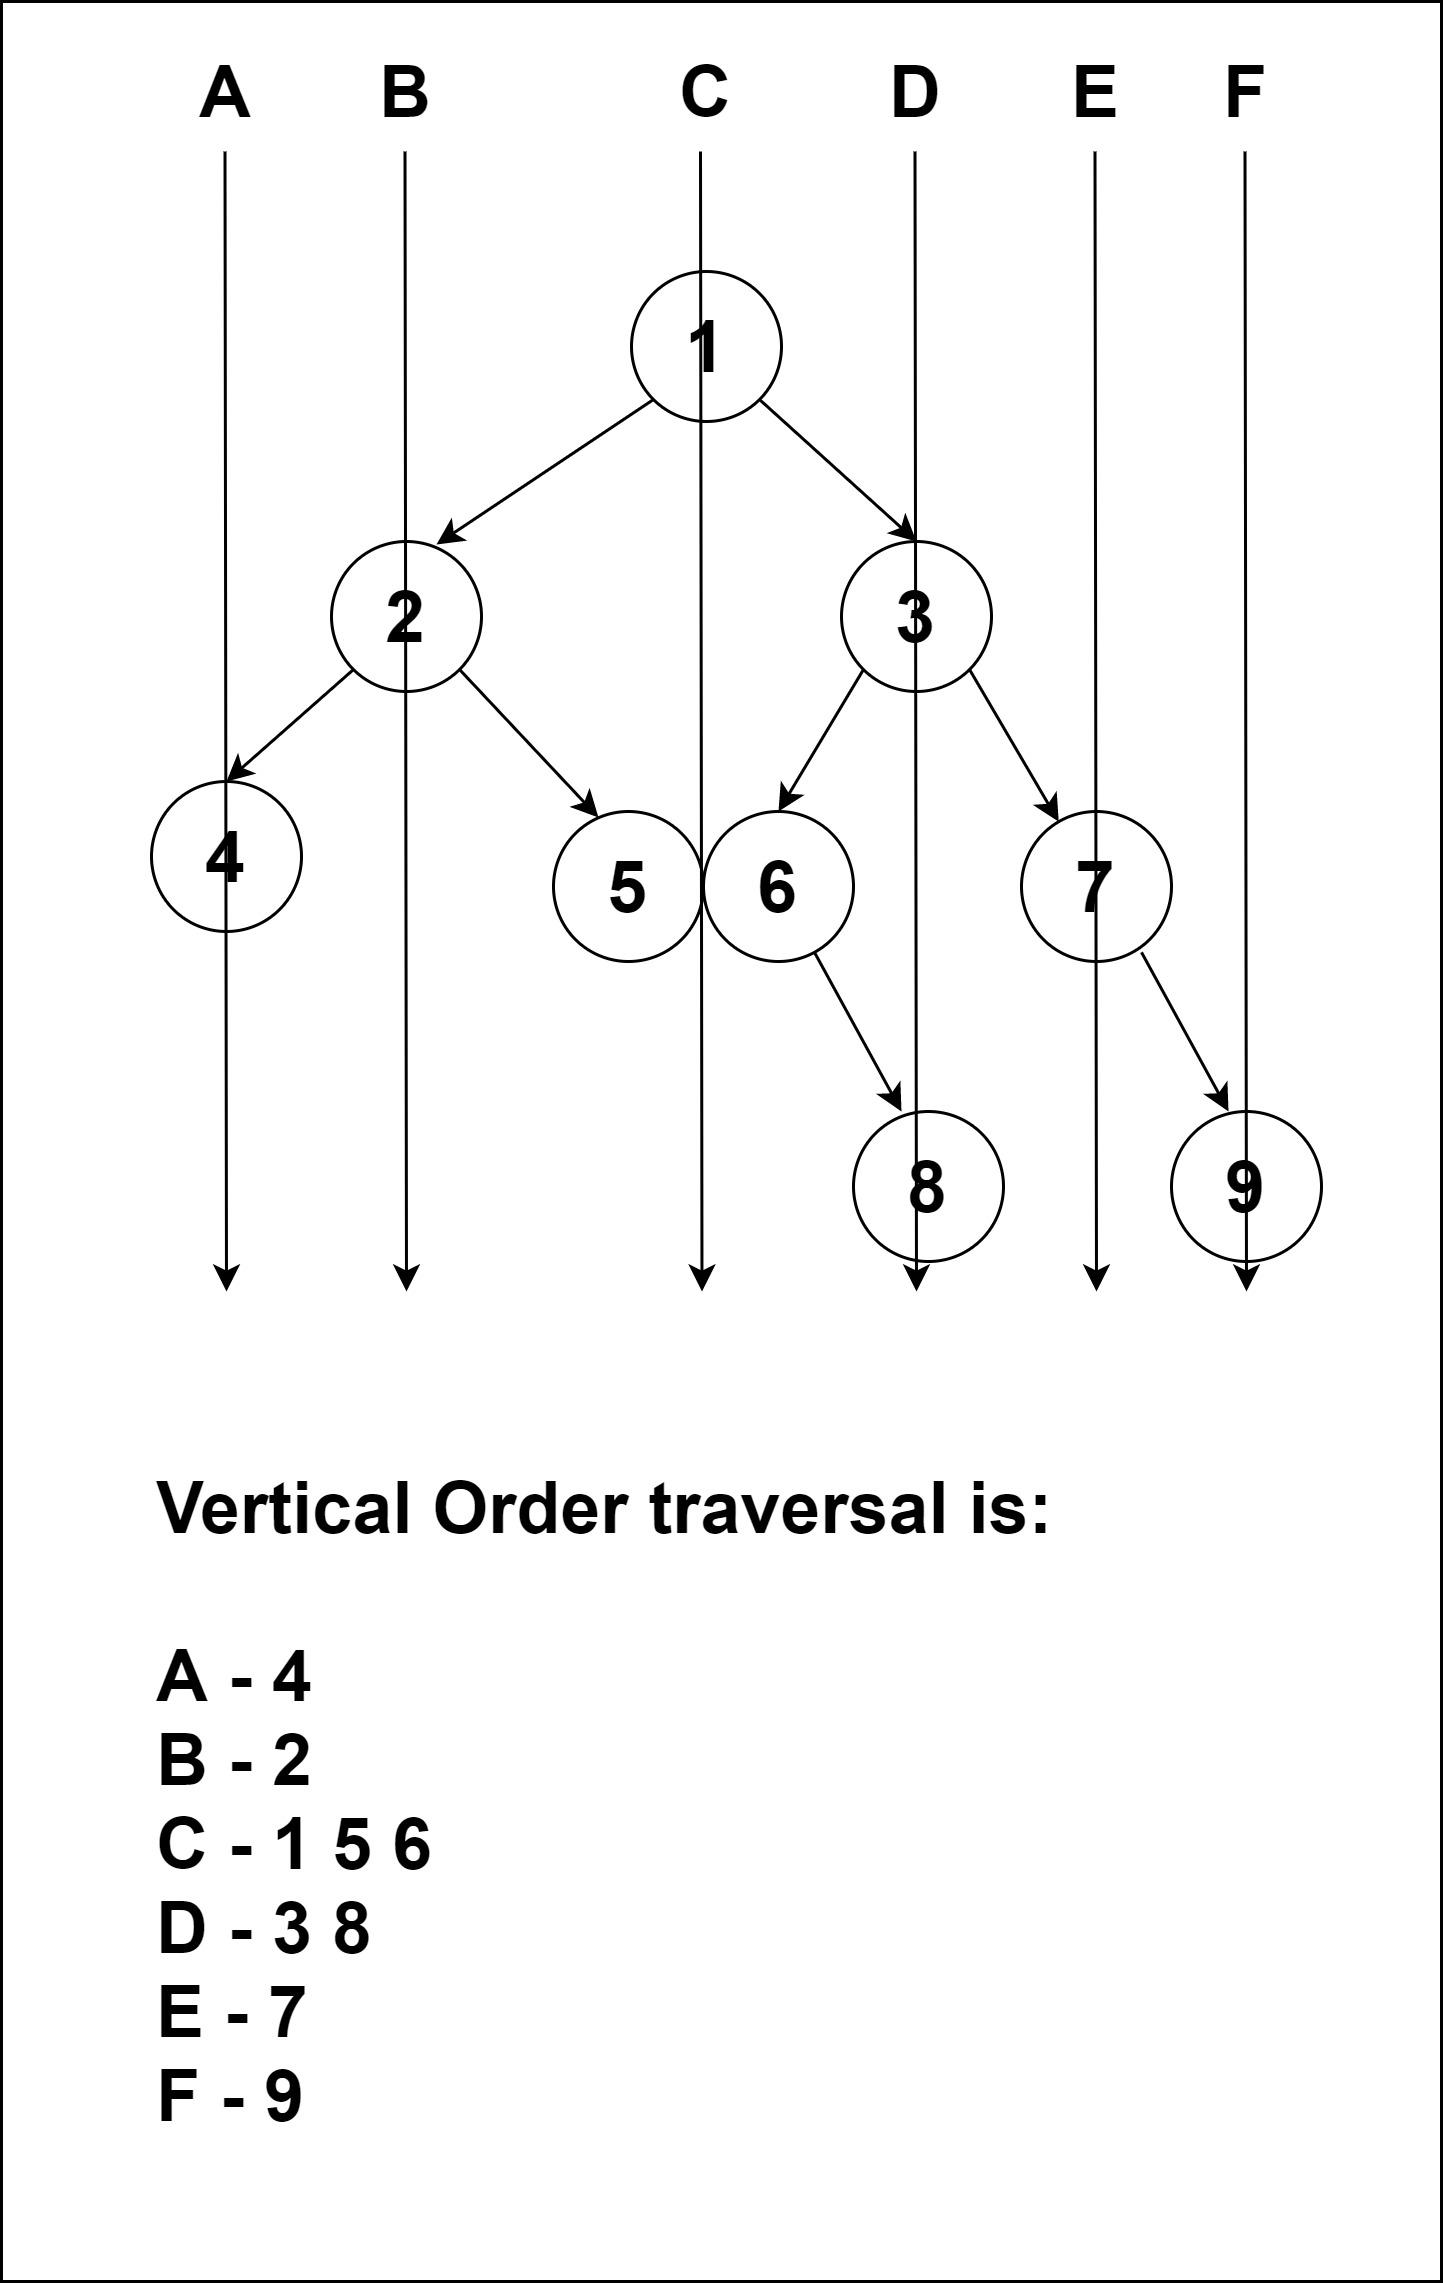 Print a Binary Tree in Vertical Order